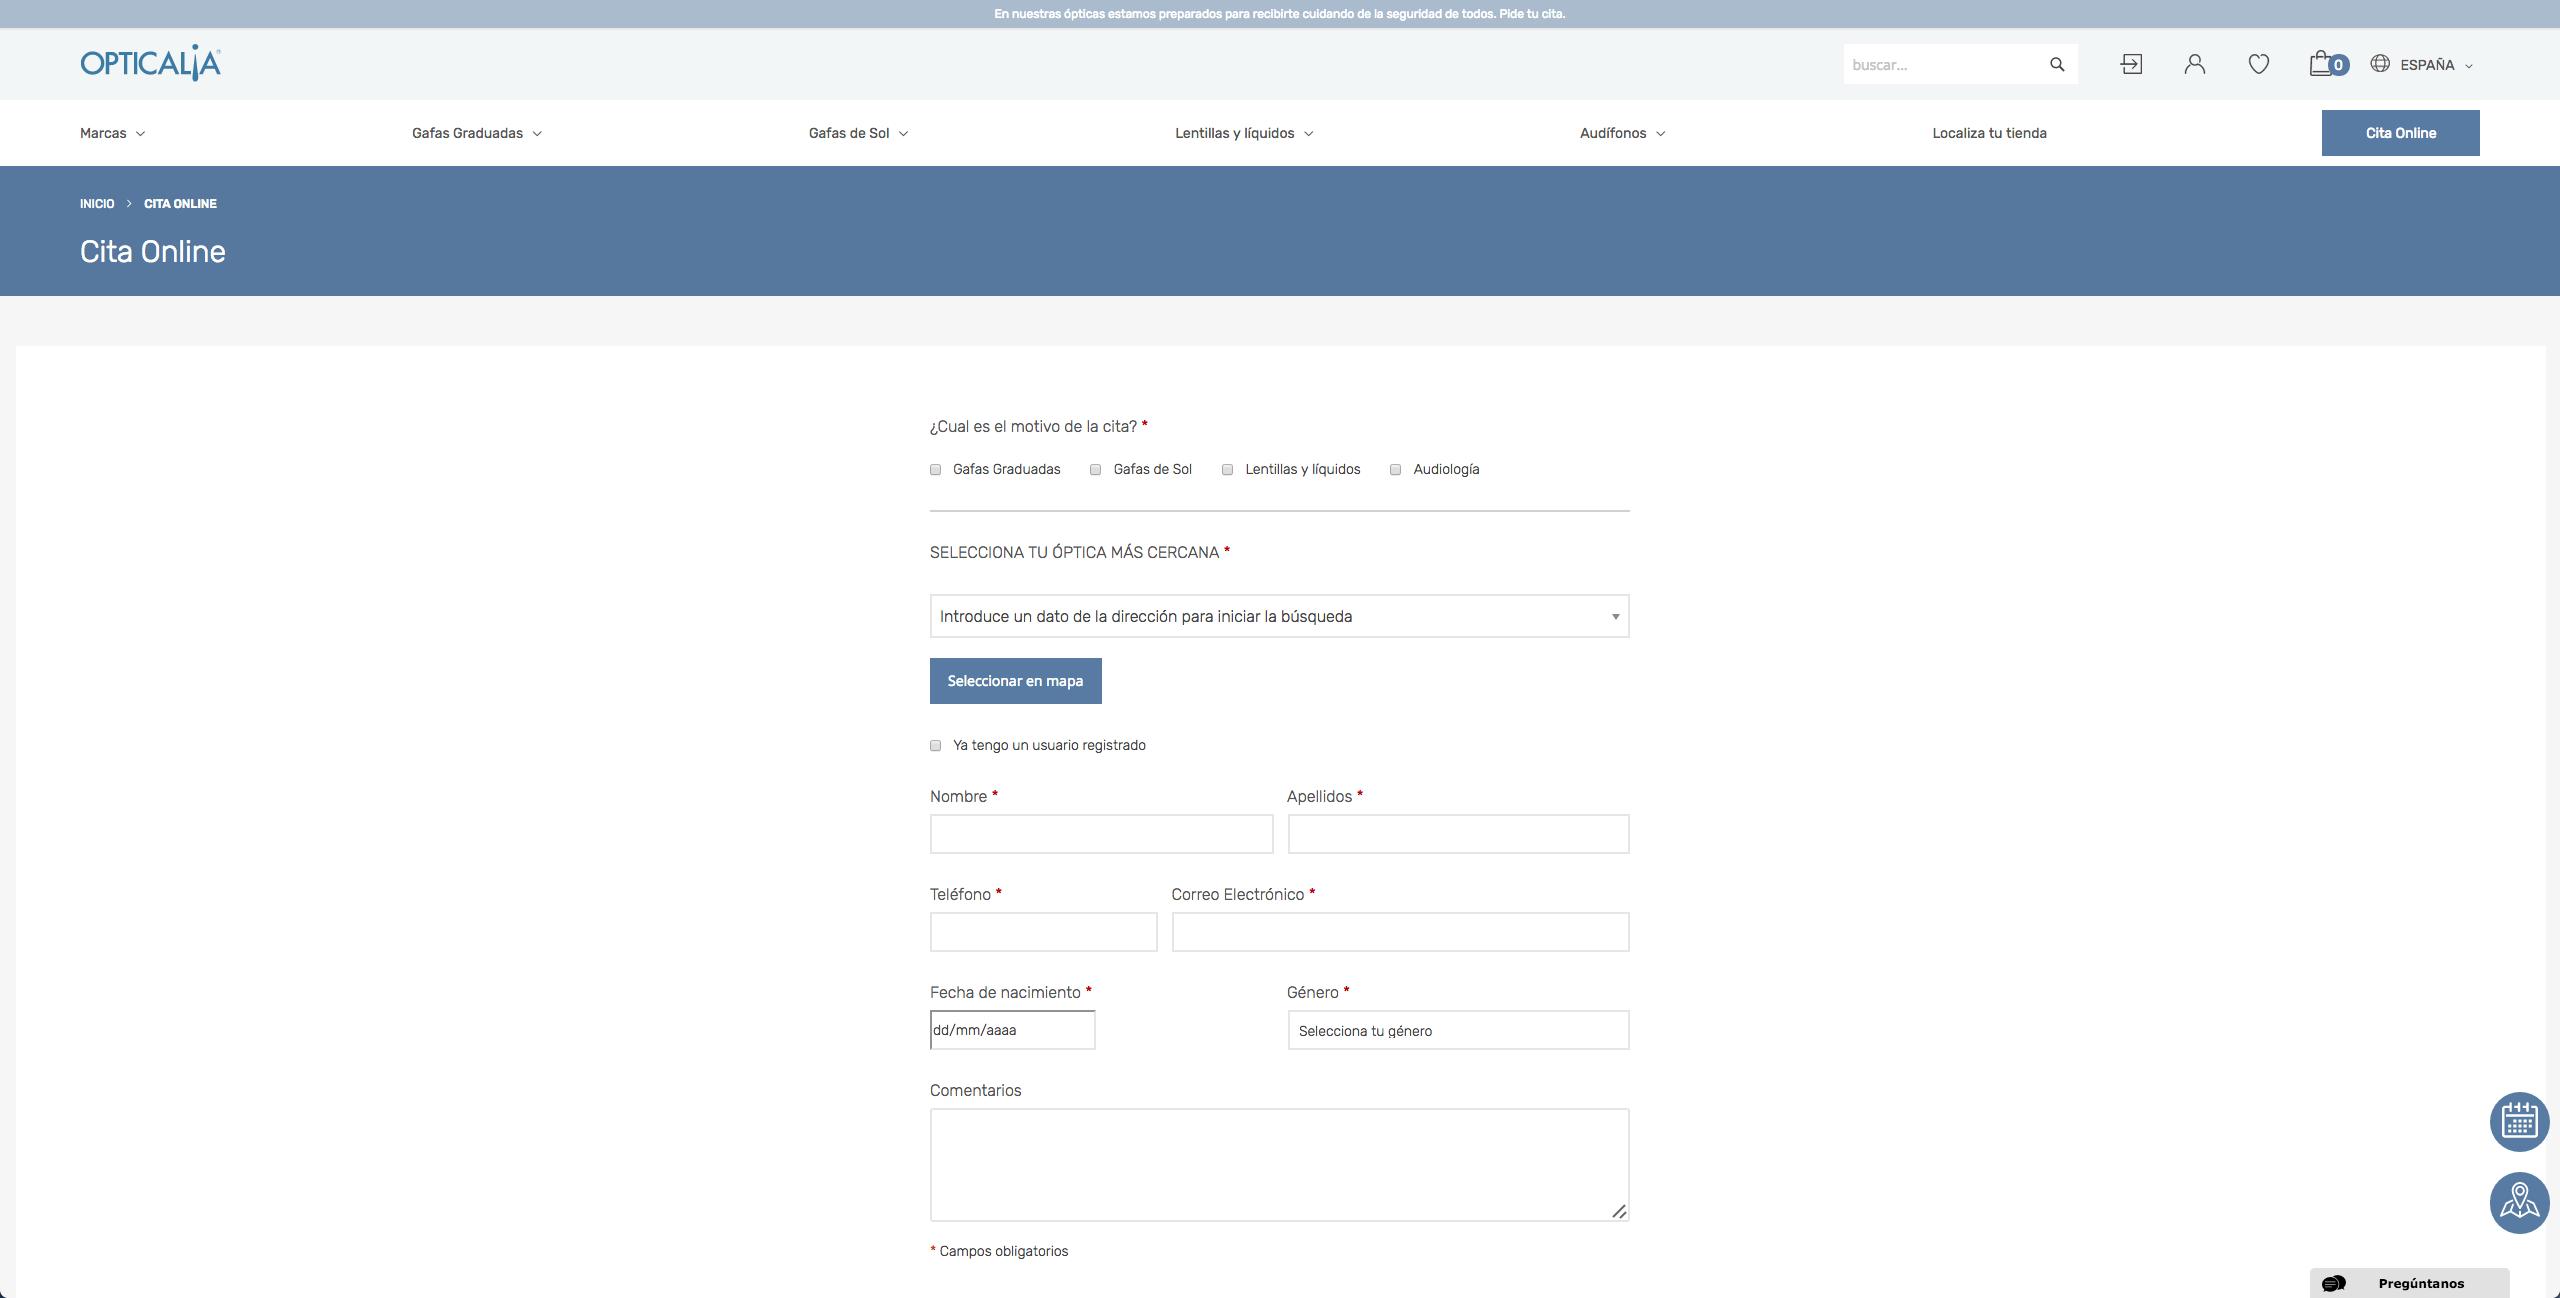 formulario pedir cita revision vista opticalia